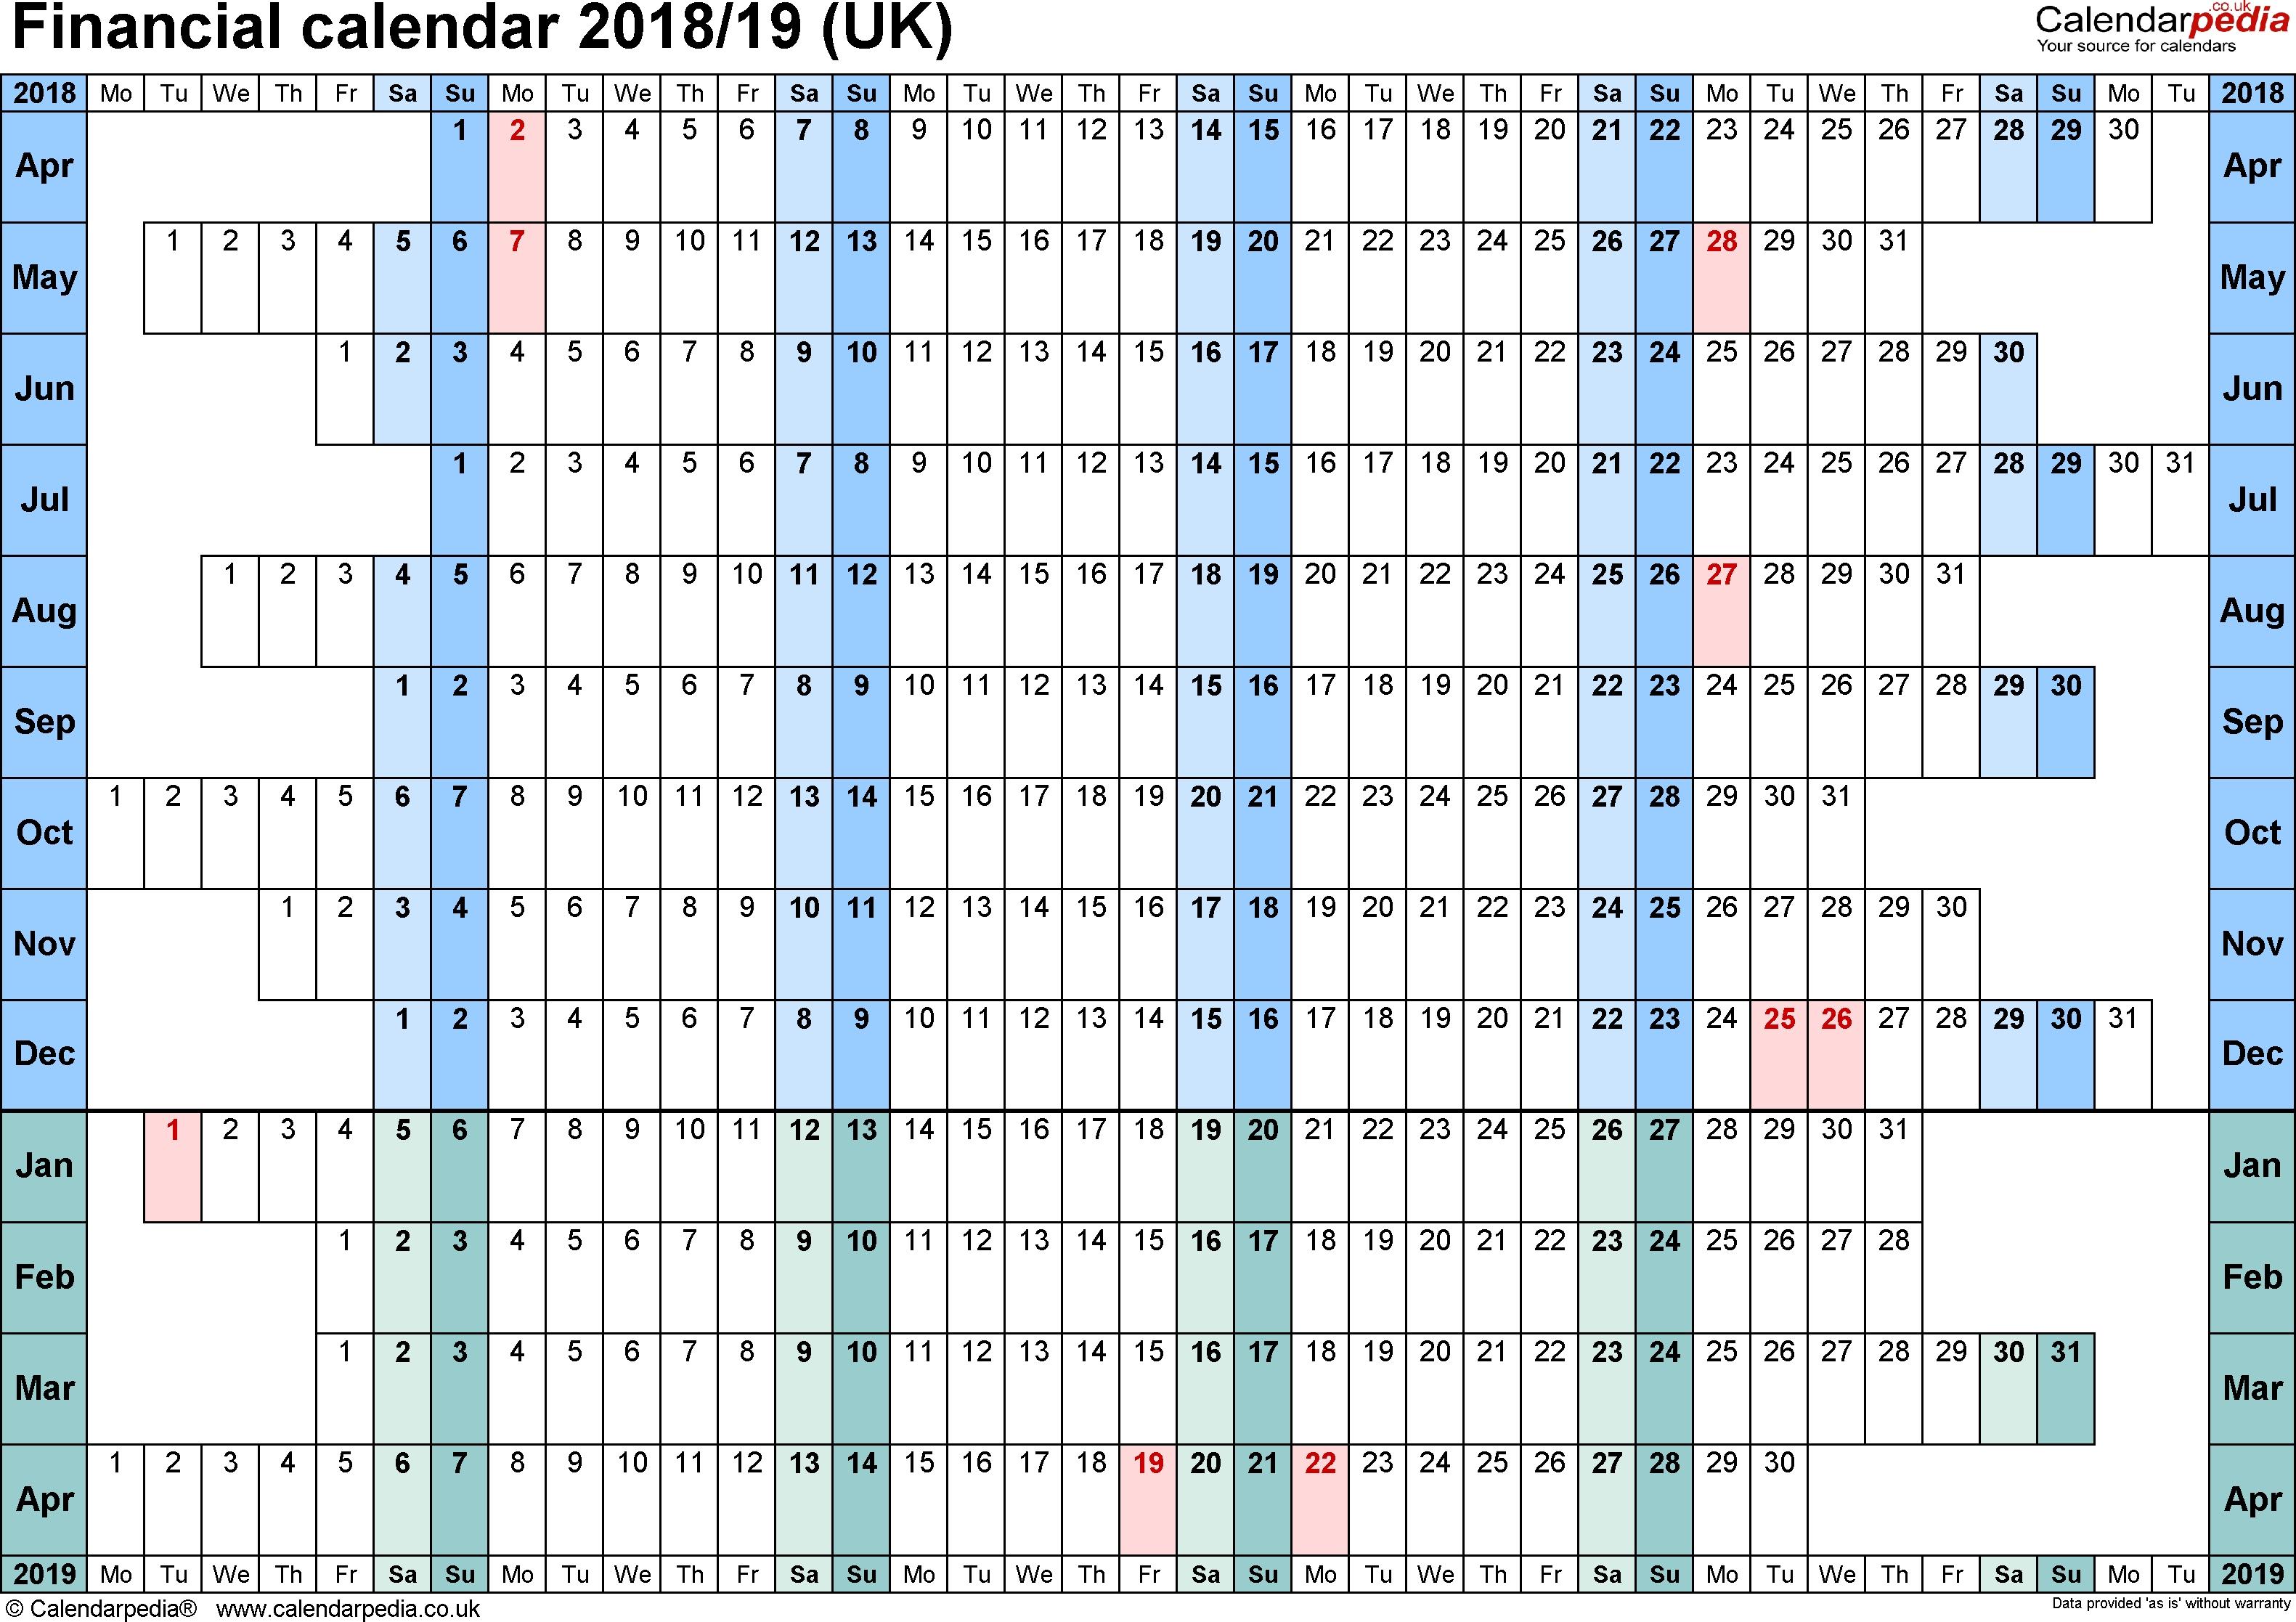 Financial Calendars 2018/19 (Uk) In Pdf Format with Network Rail Calendar Week Numbers